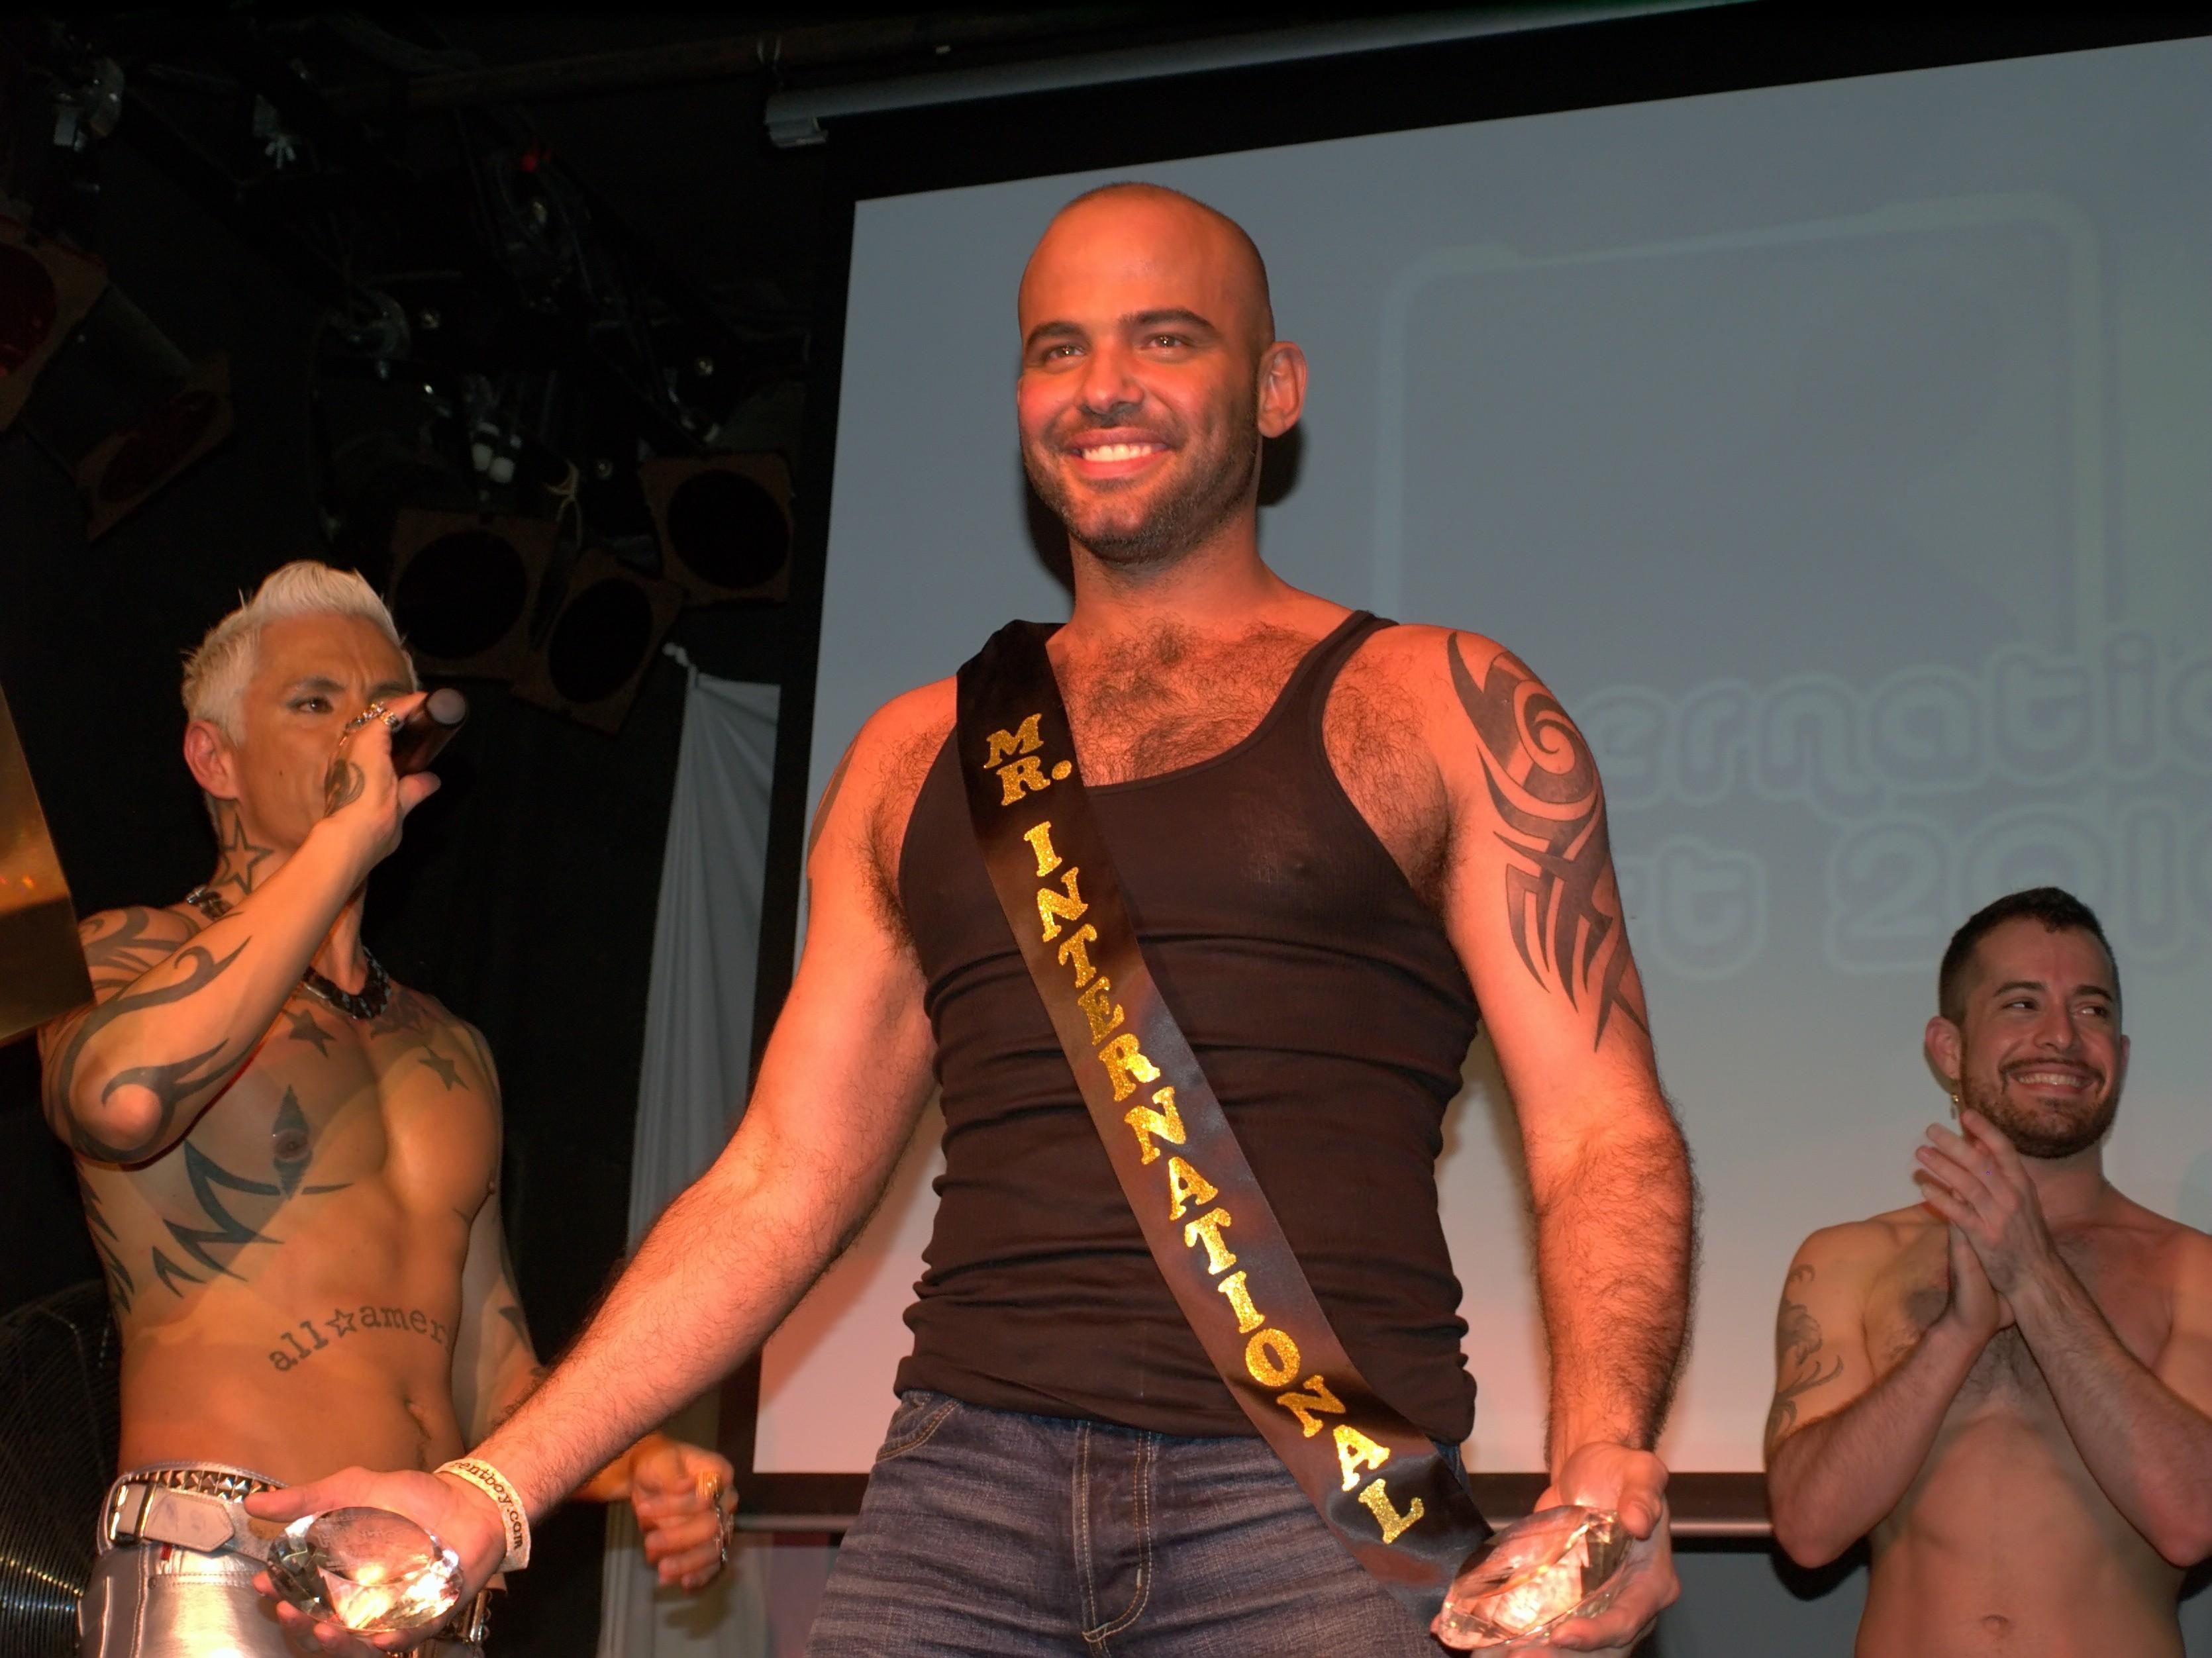 international gay escort videos de xxx